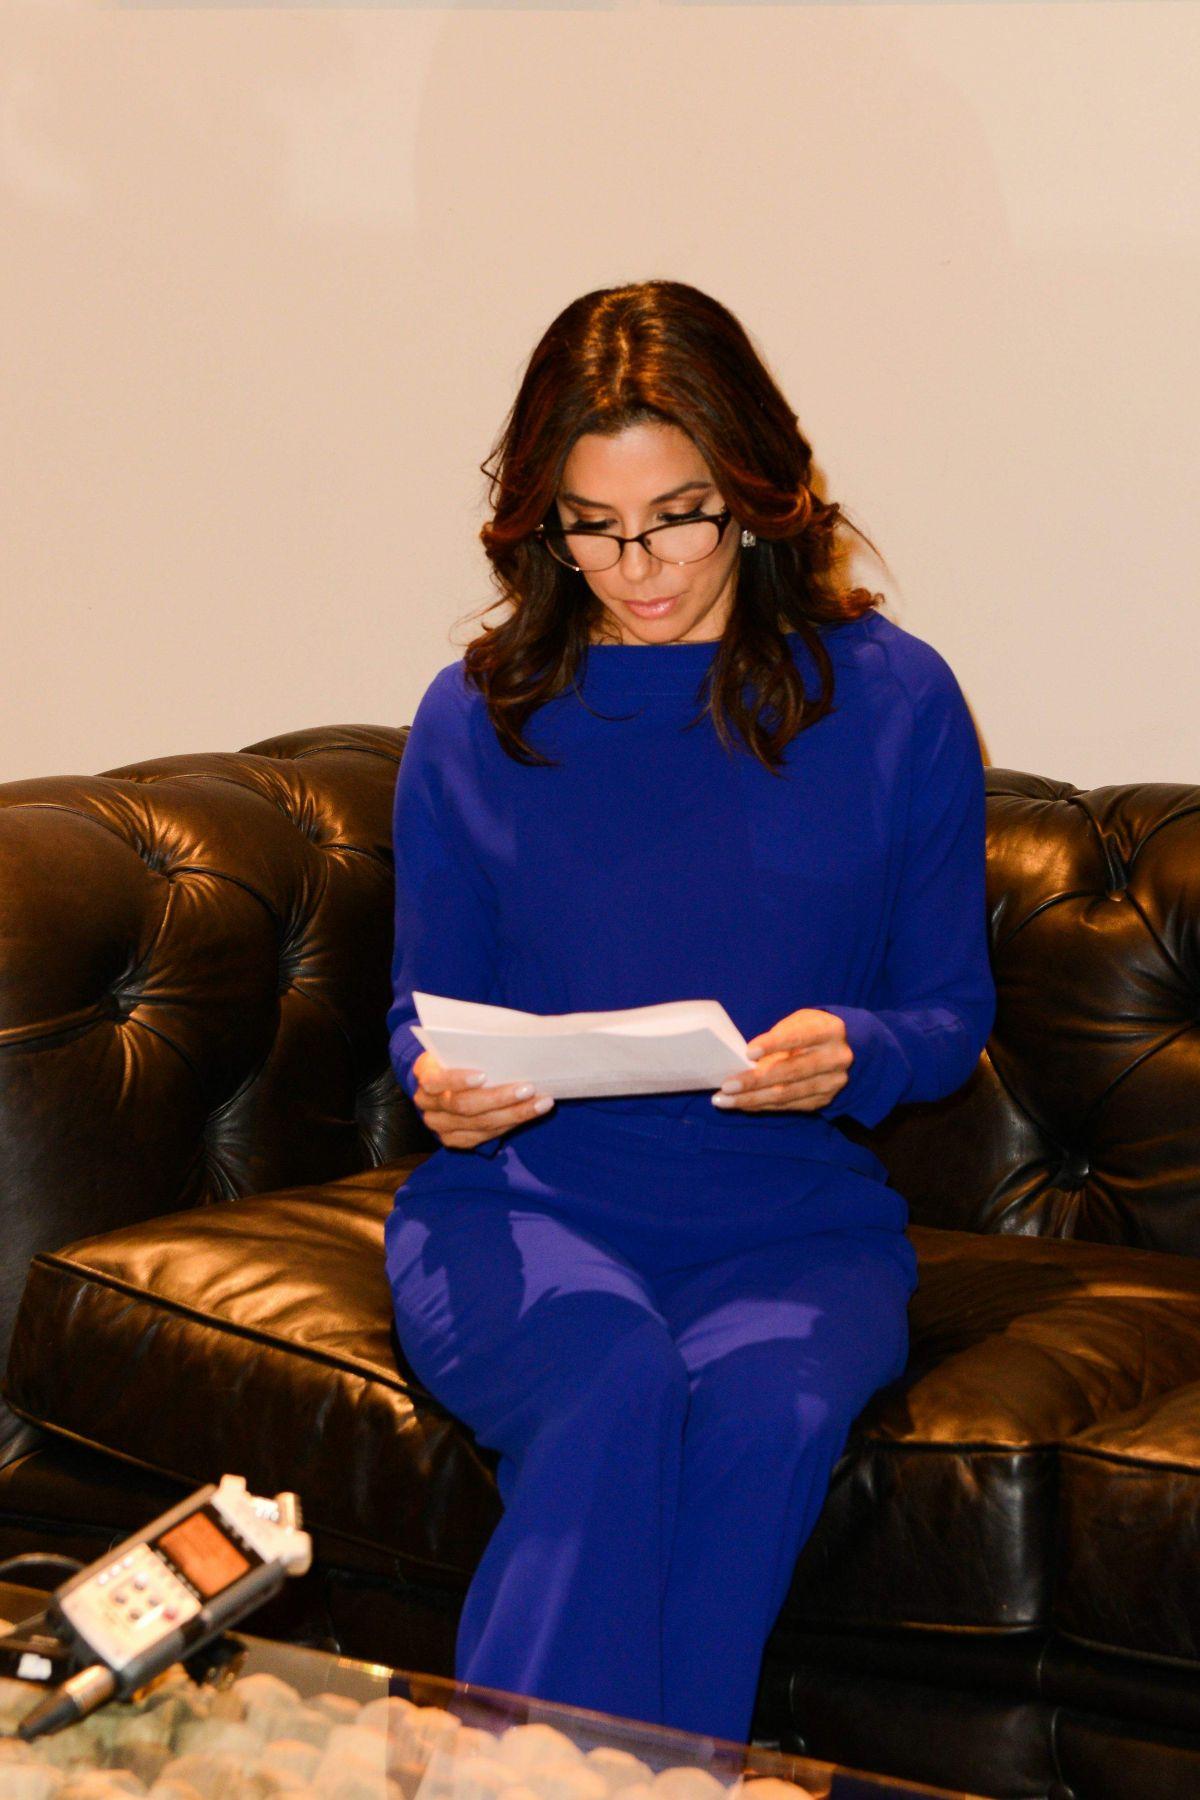 Eva Longoria At Marina Interiors Furniture Store In Dubai Hawtcelebs